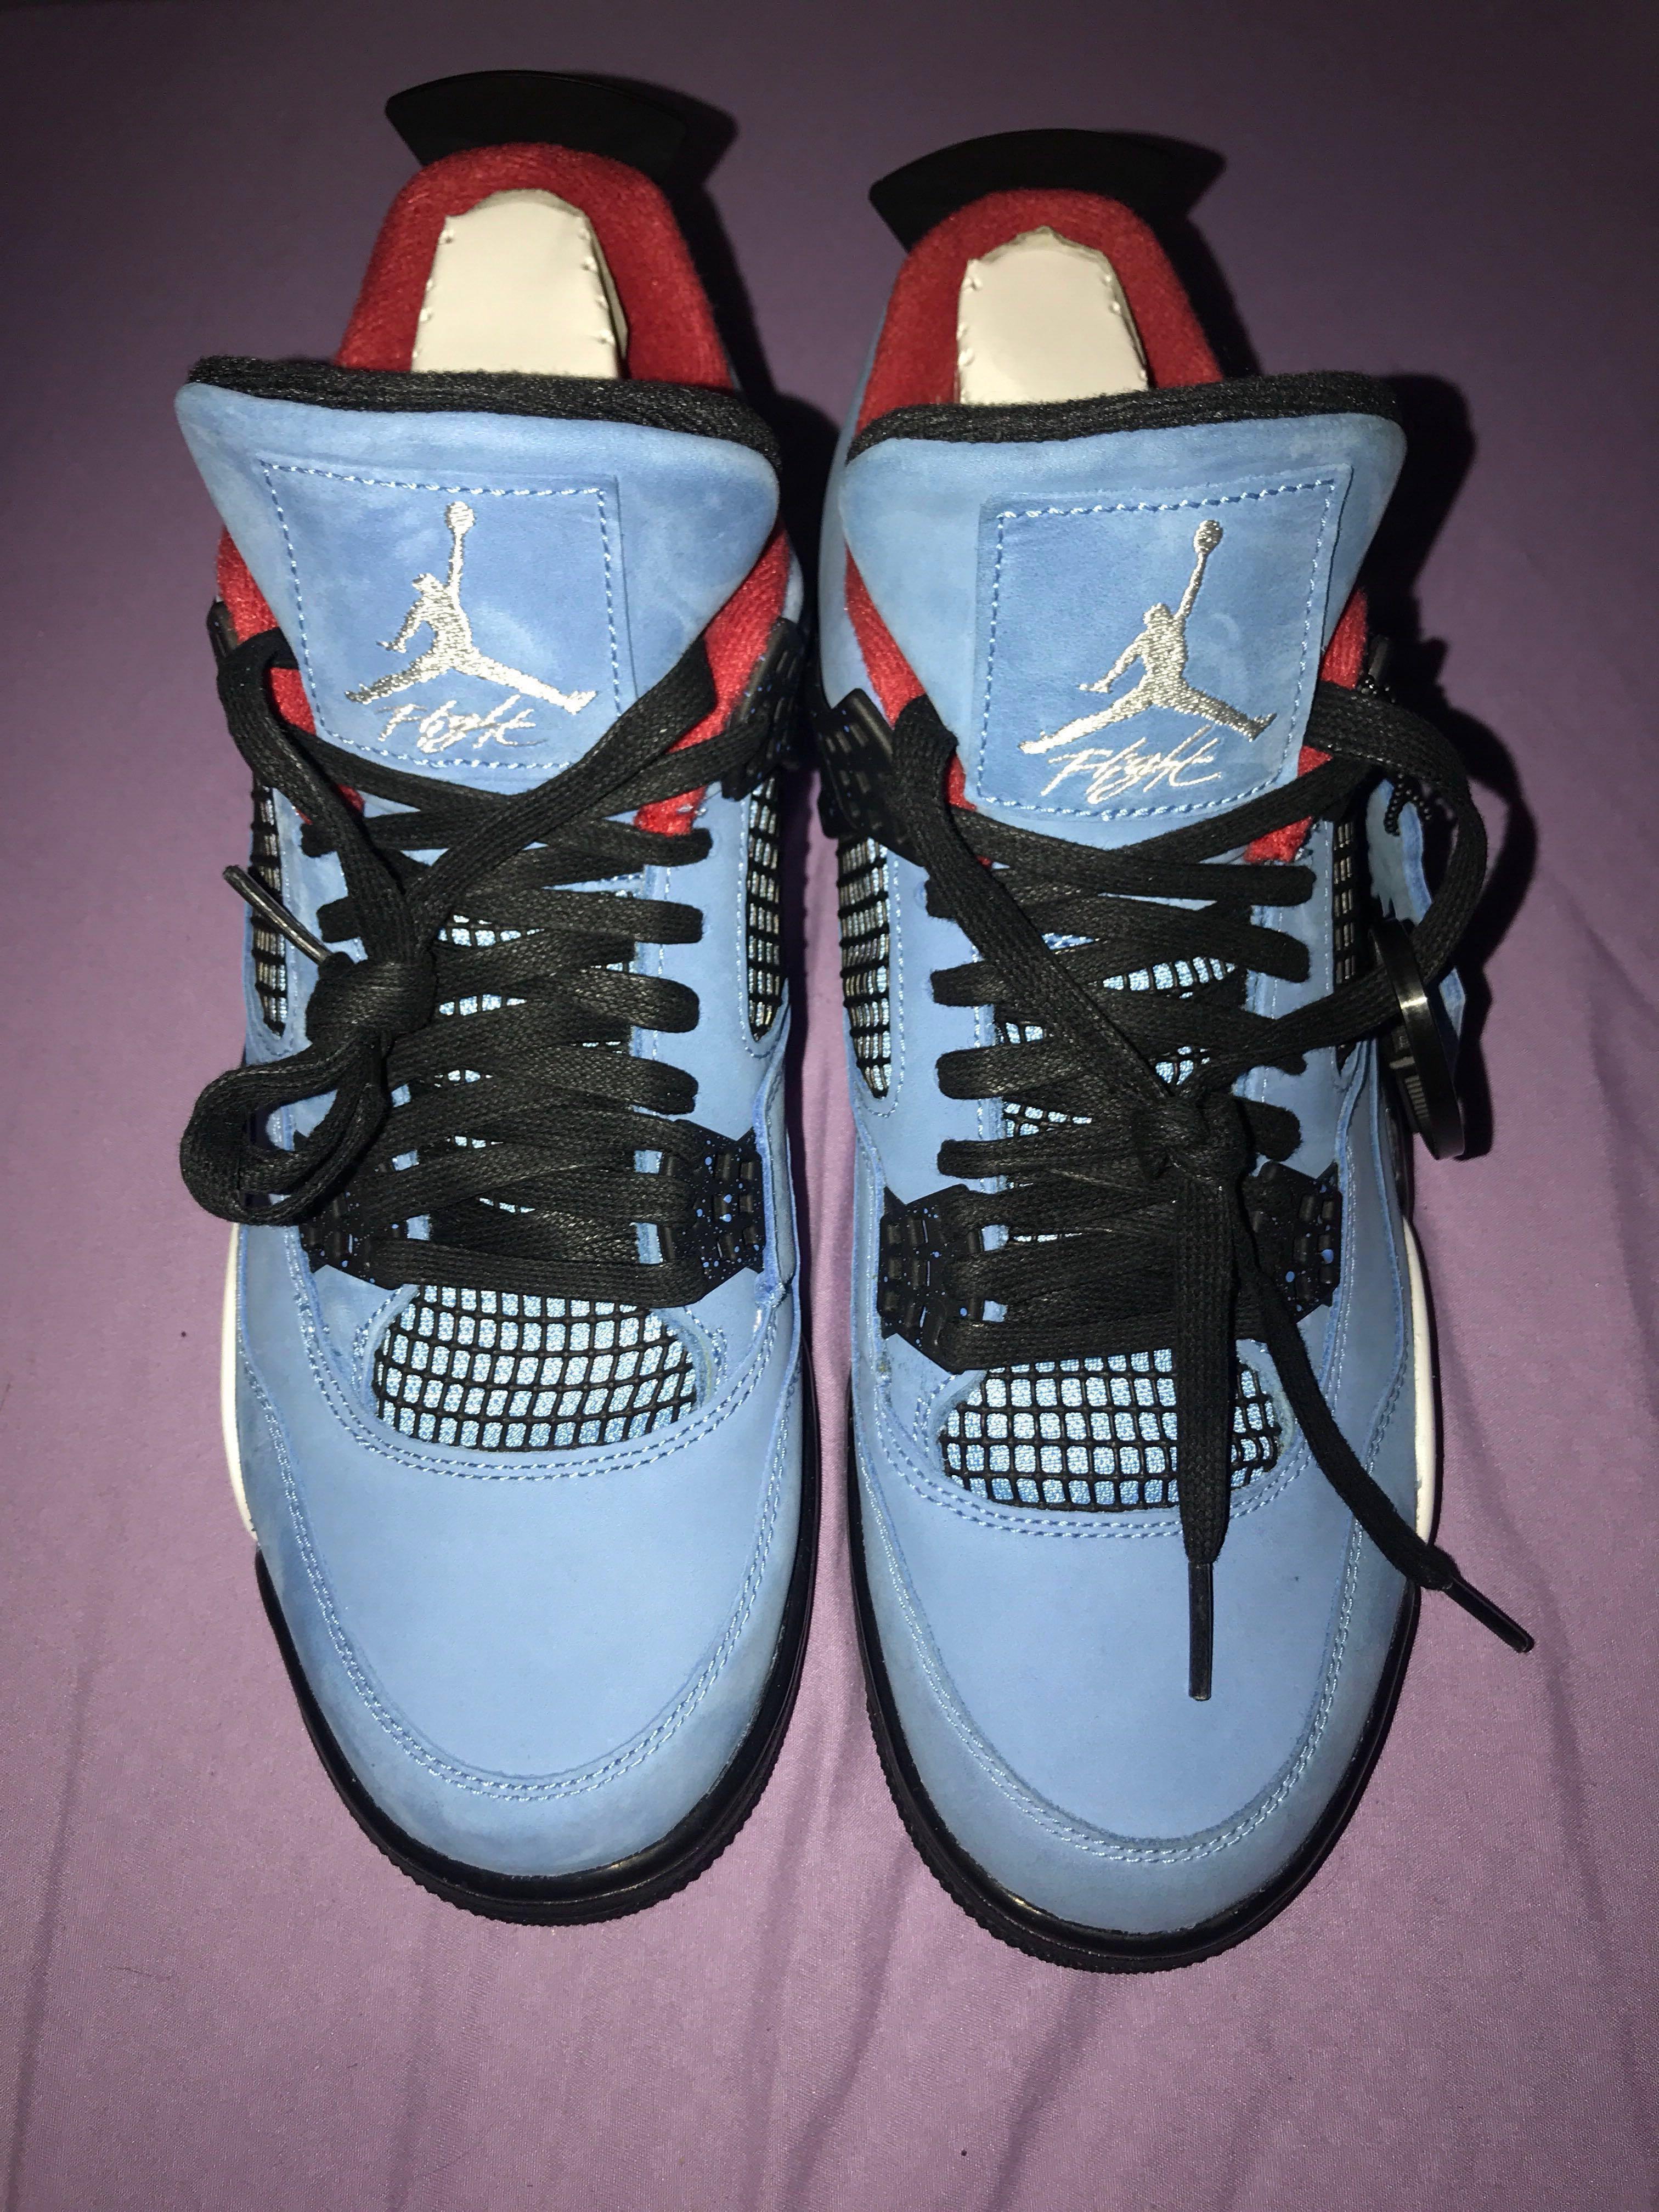 61f21232abb Travis Scott Air Jordans 4 Retro (Cactus Jack), Men's Fashion, Footwear,  Sneakers on Carousell